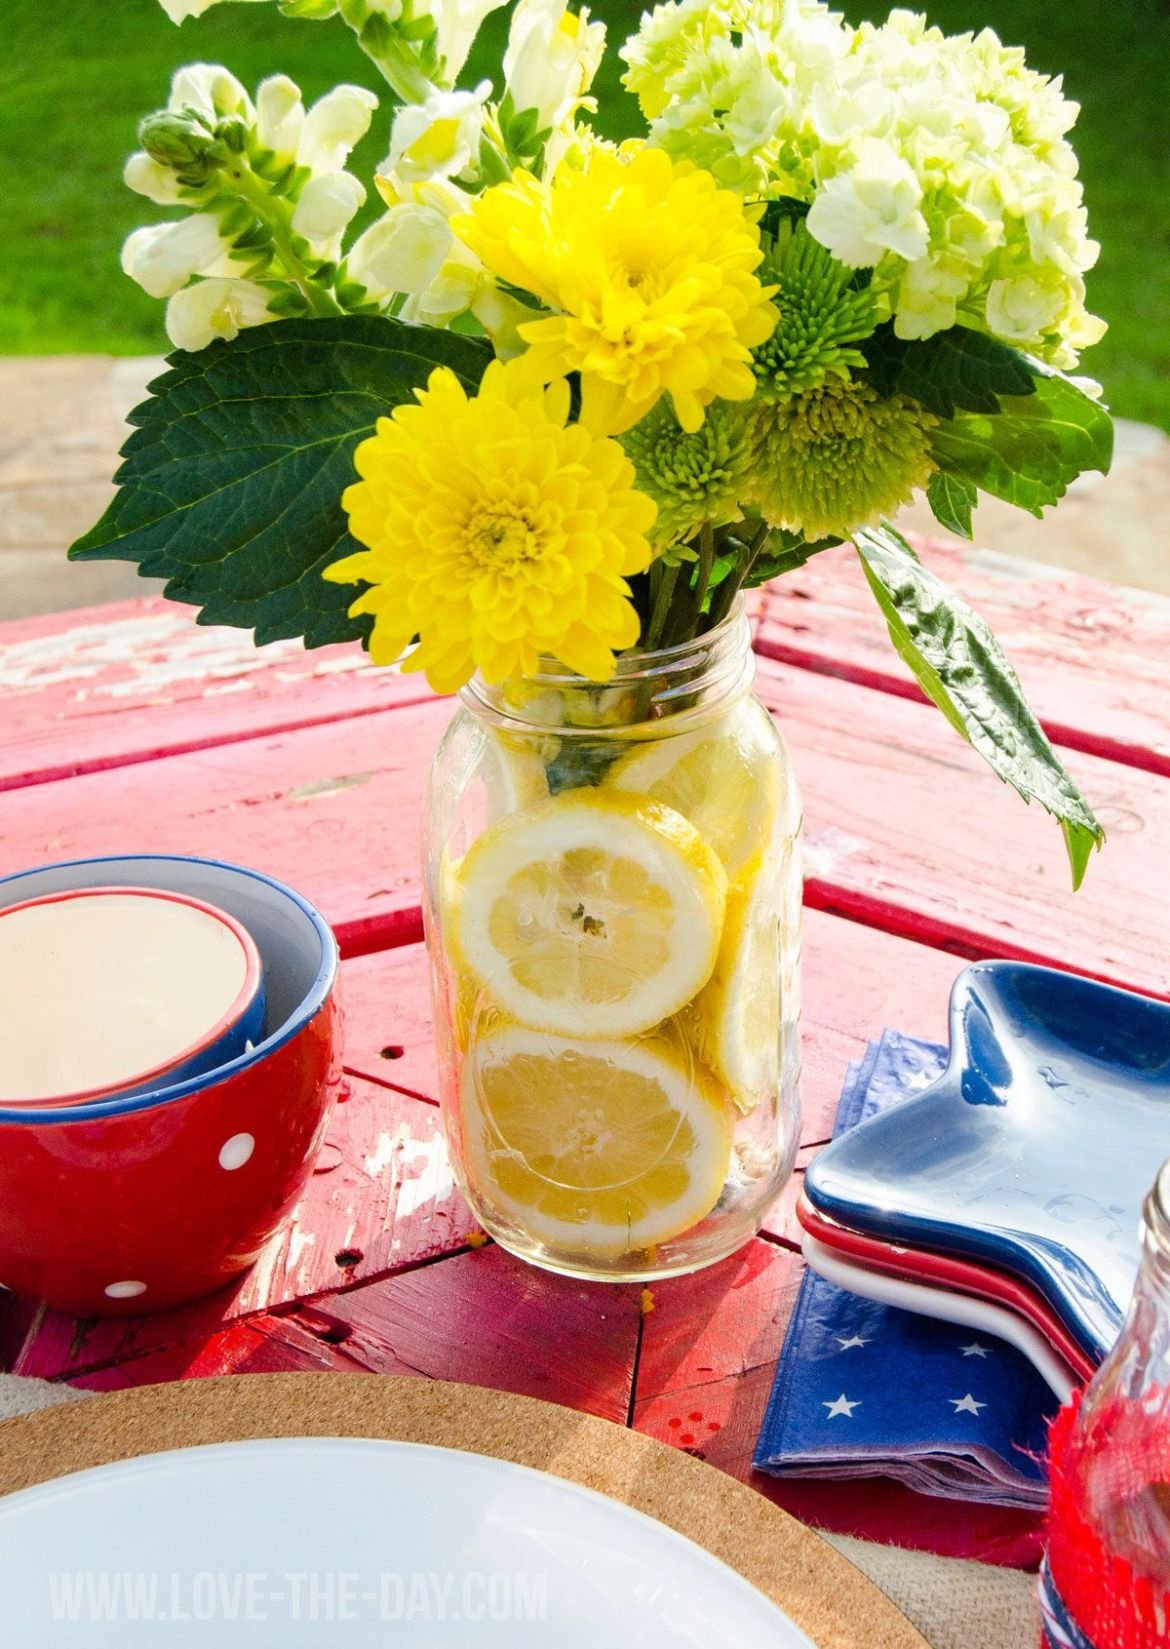 DIY Lemon Centerpiece by Love The Day